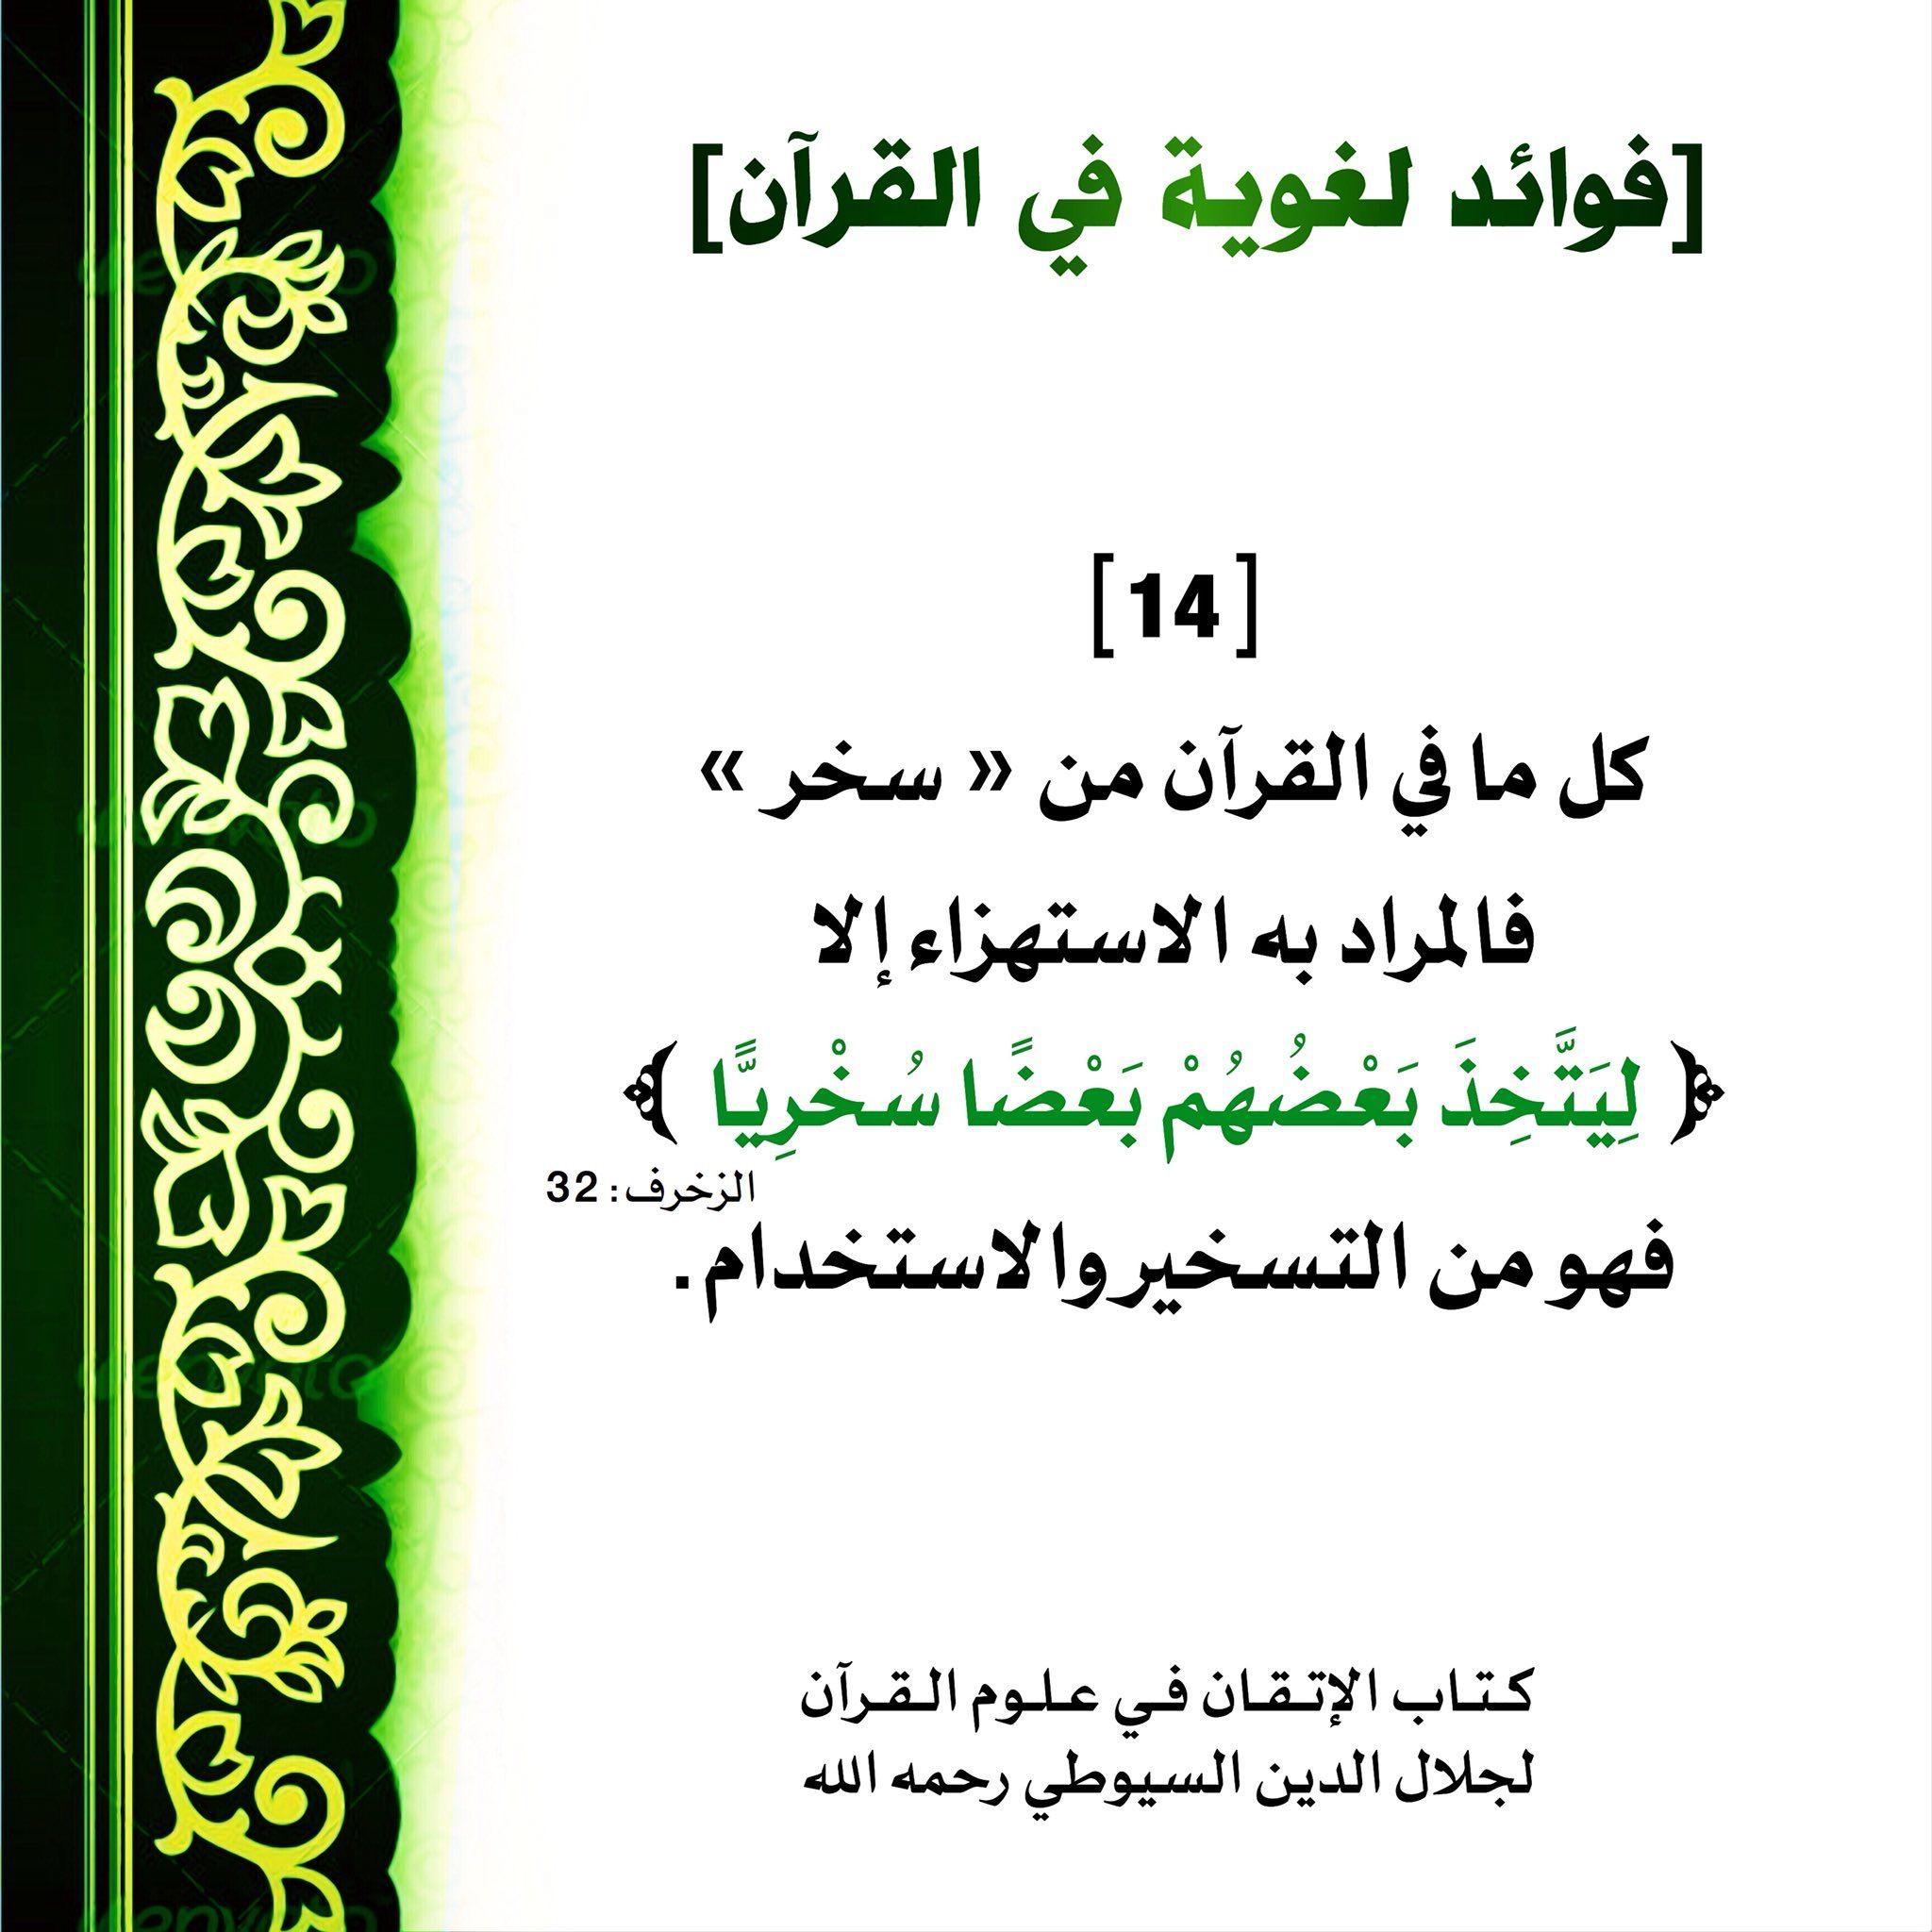 Pin By Madi On فوائد لغوية في القرآن Islamic Love Quotes Quran Tafseer Quran Verses